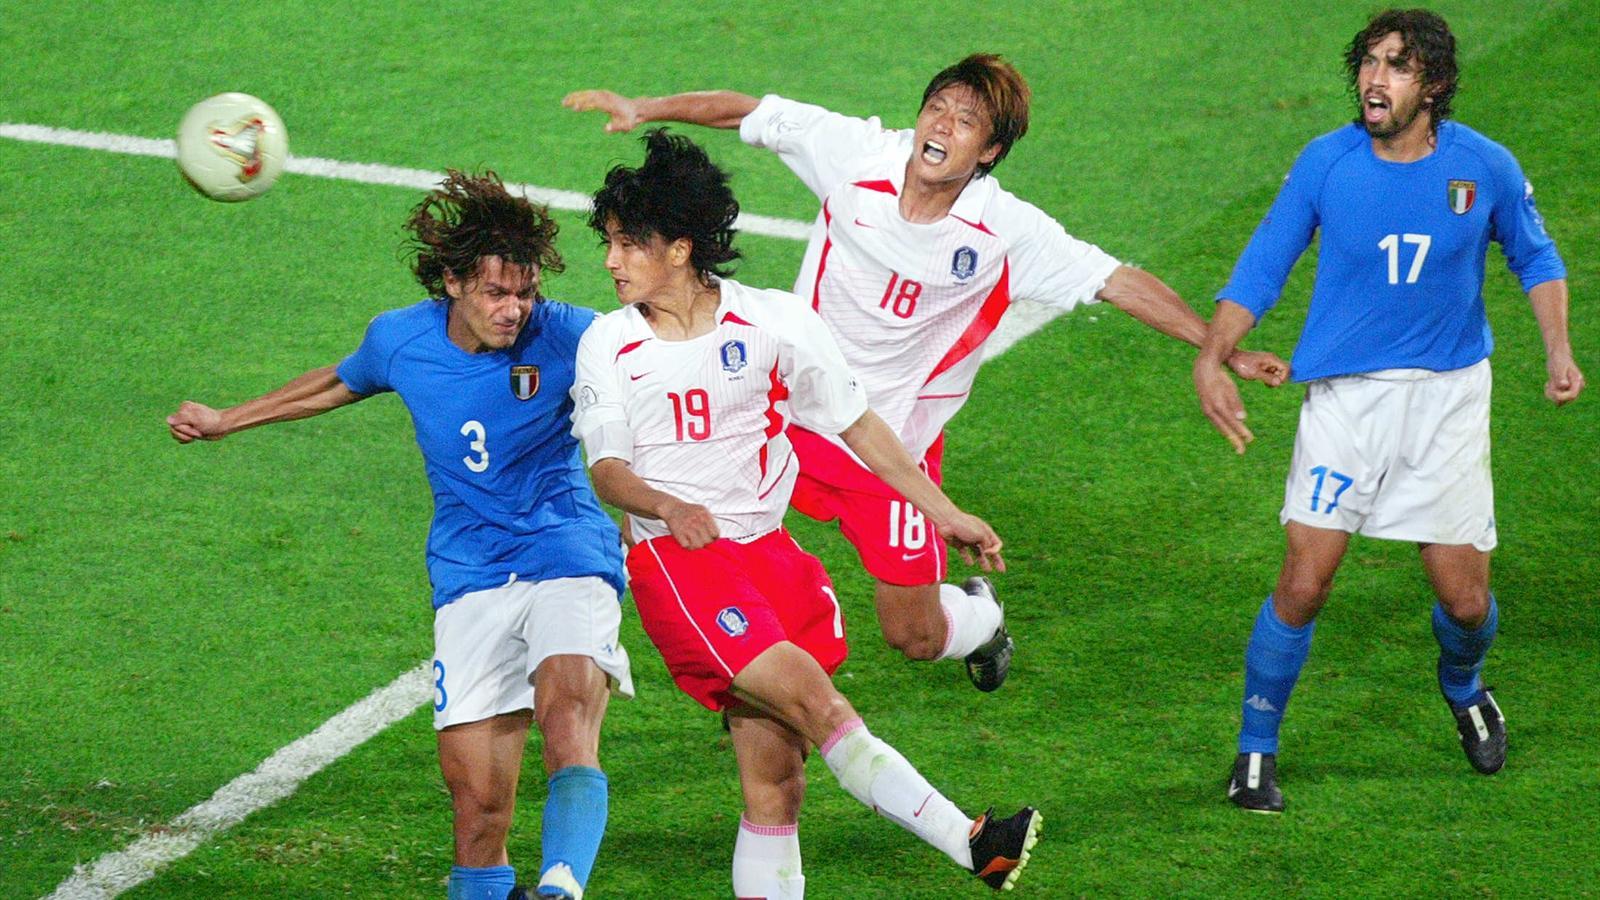 L equipe du bresil 2002 cadillac - Bresil coupe du monde 2002 ...